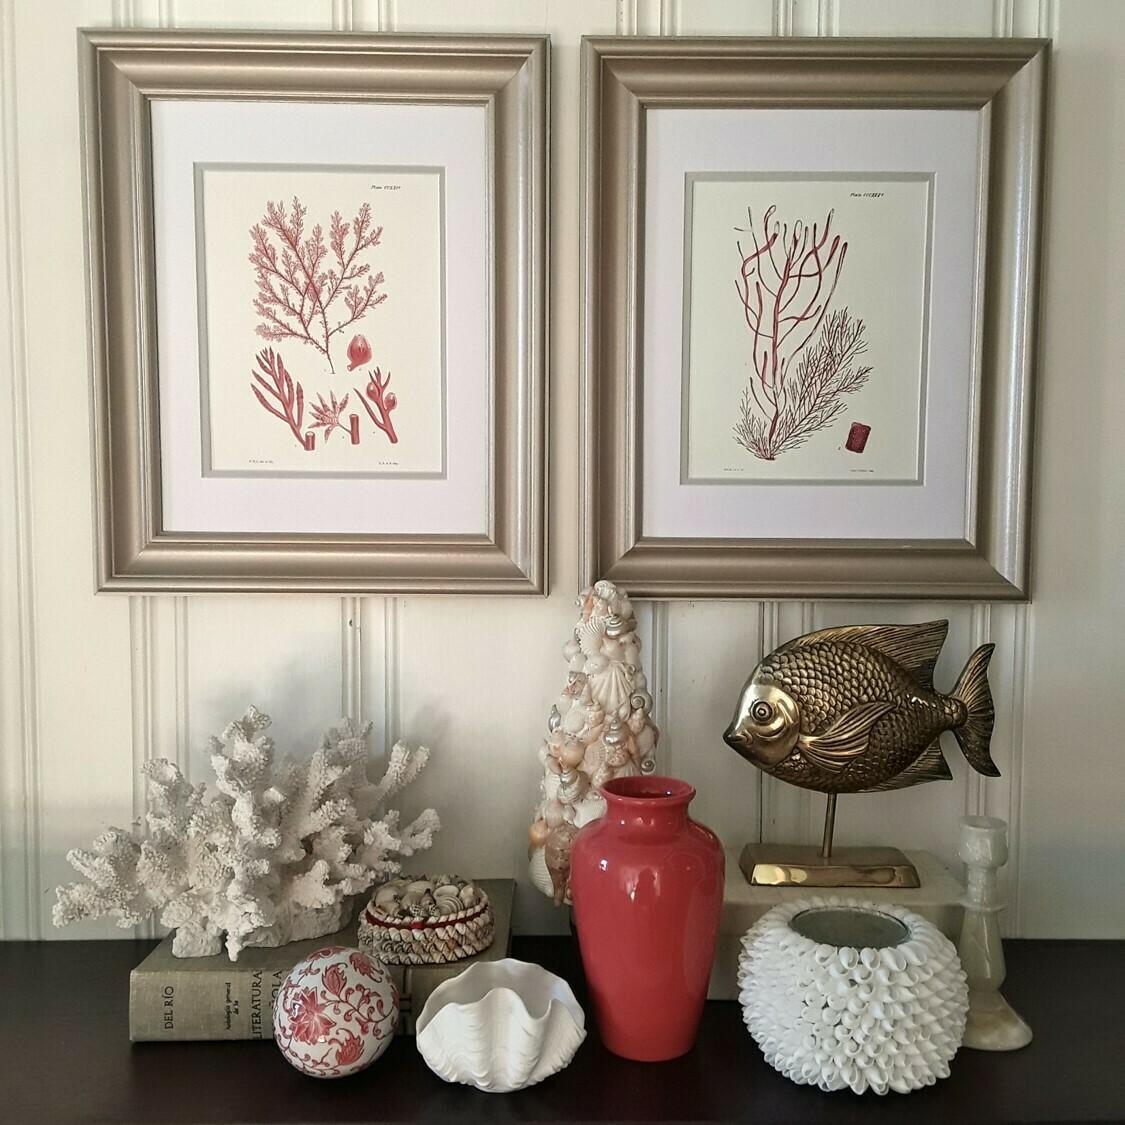 Set of 2 Matted and Framed Vintage Red Coral Prints